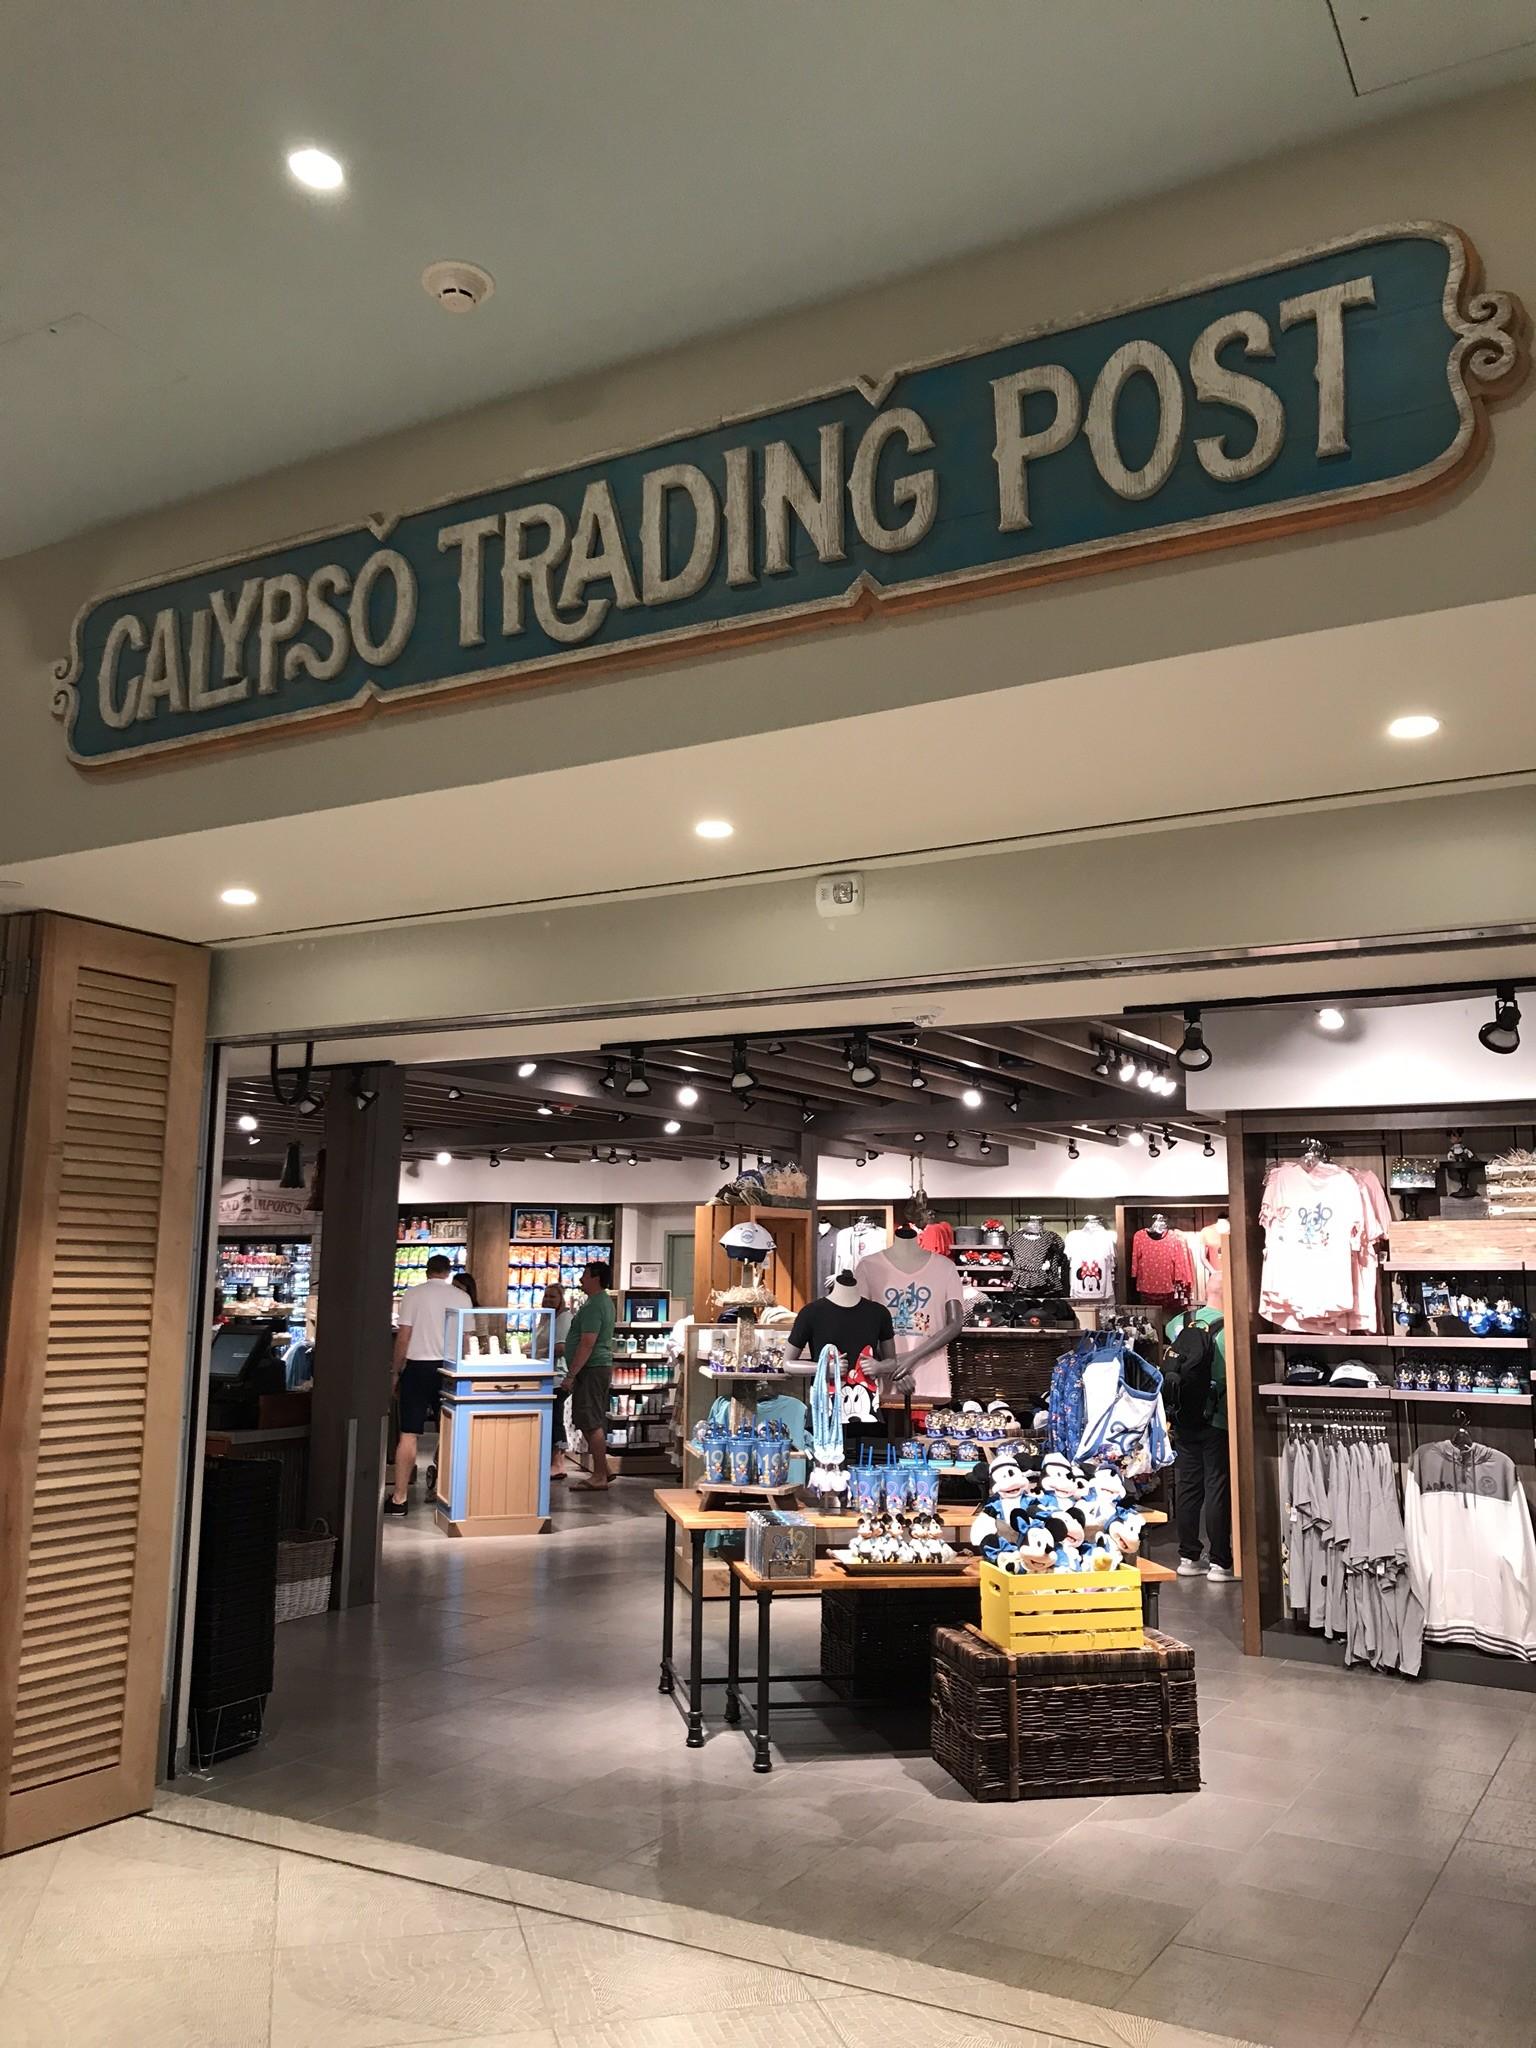 calypso trading post souvenir store